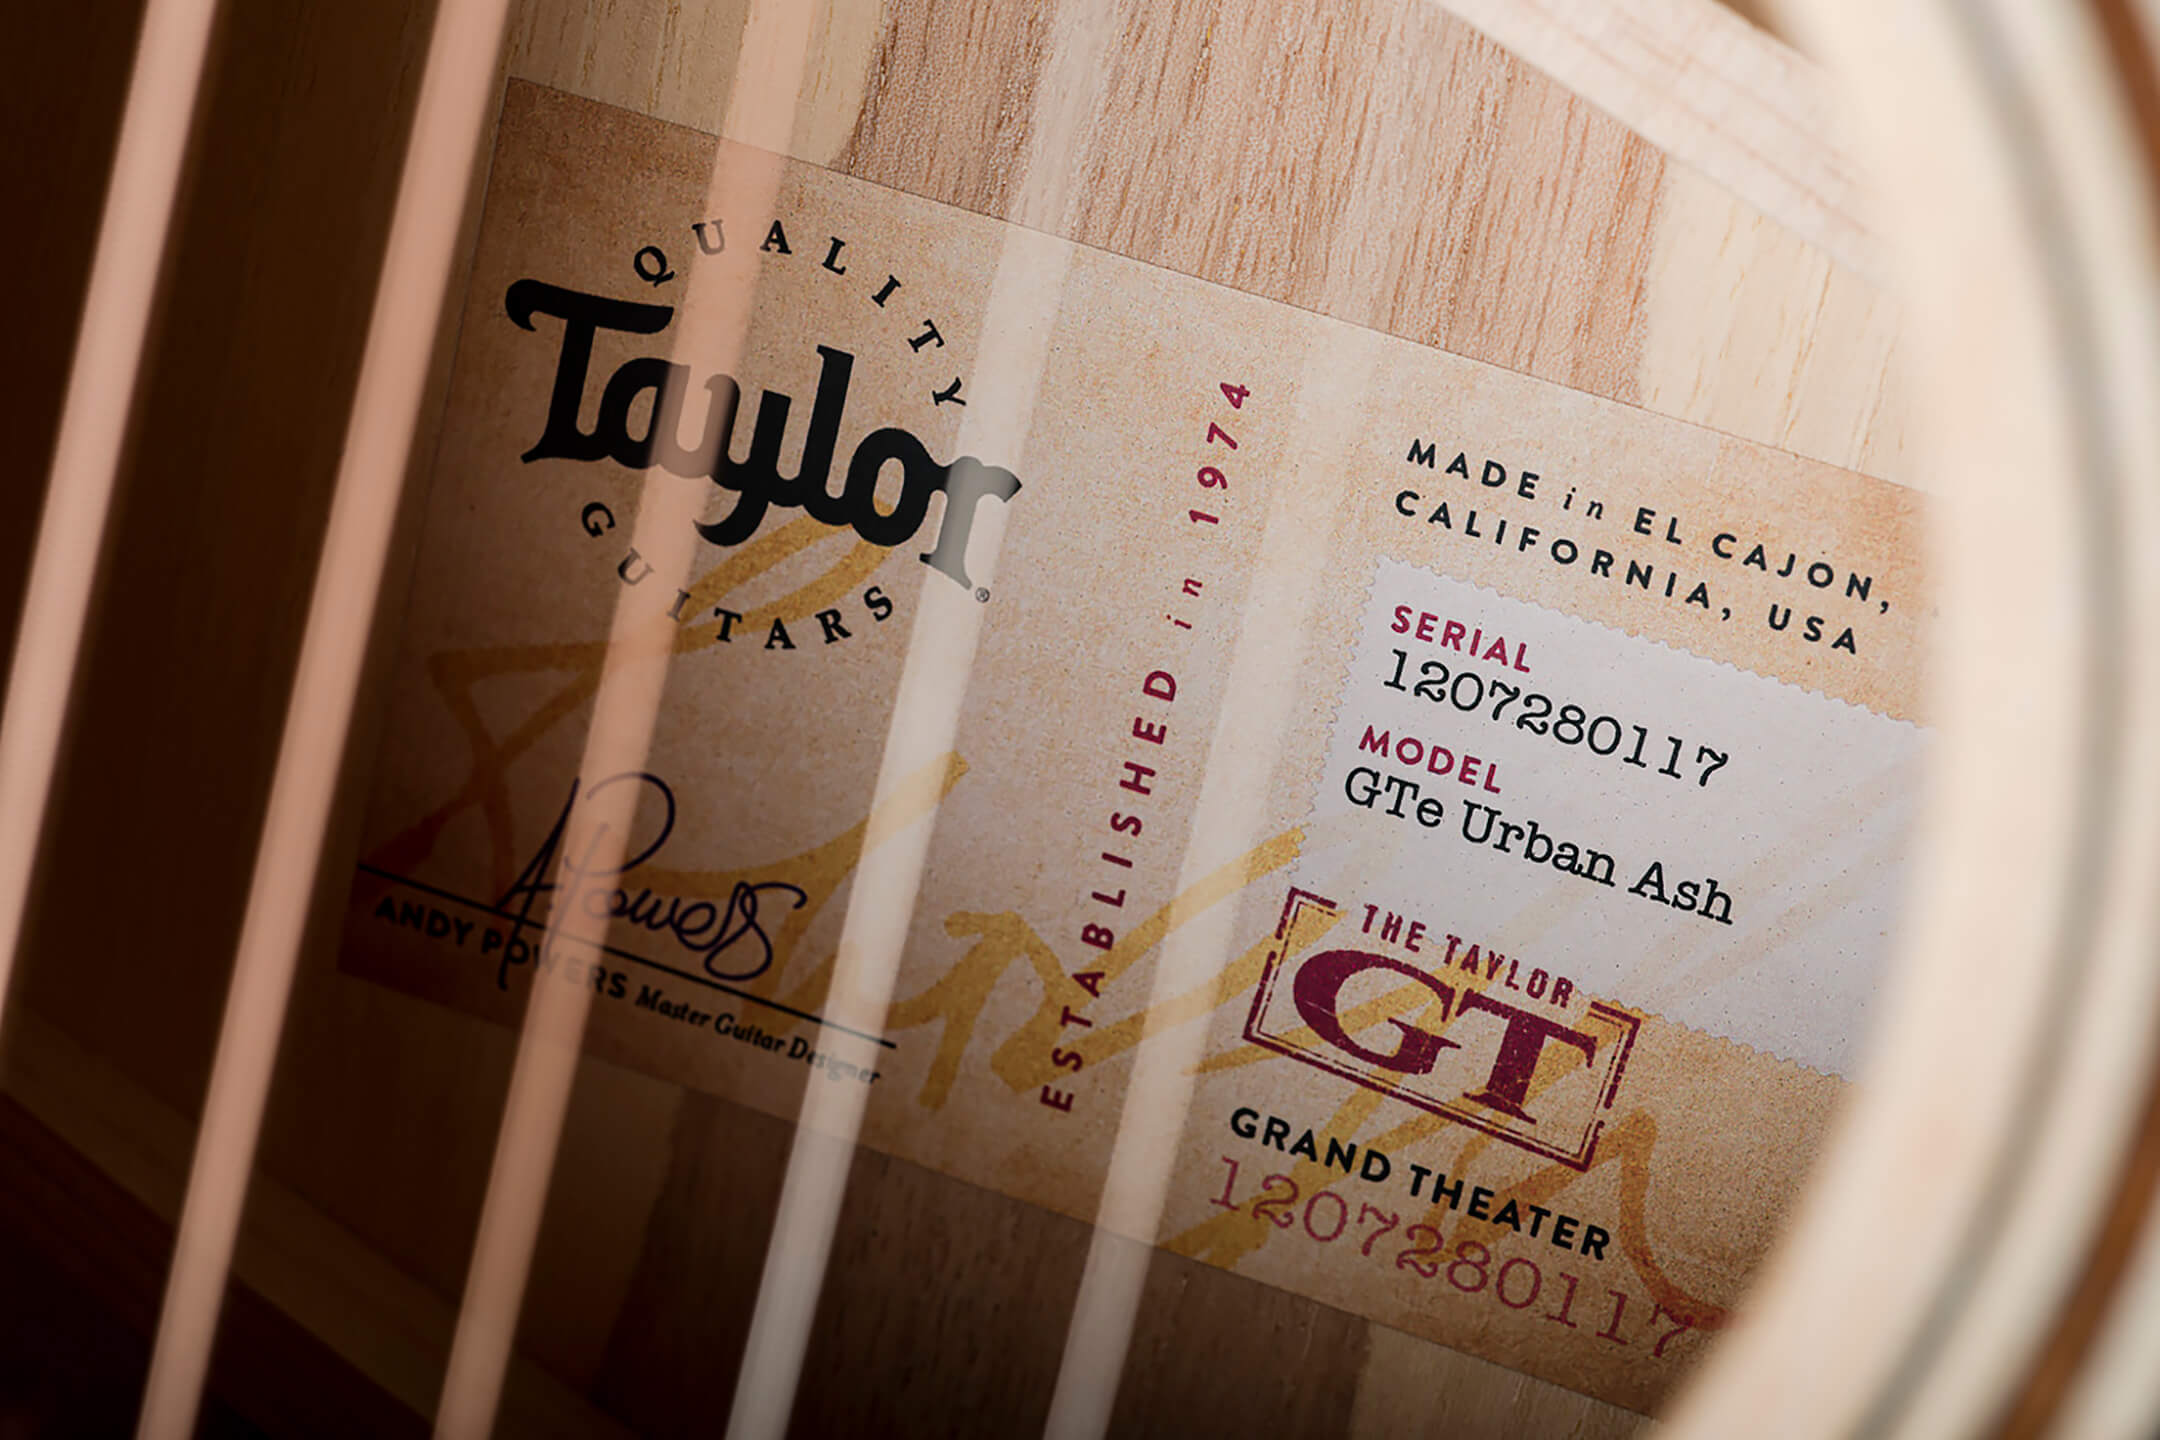 Taylor Guitars GTe Urban Ash